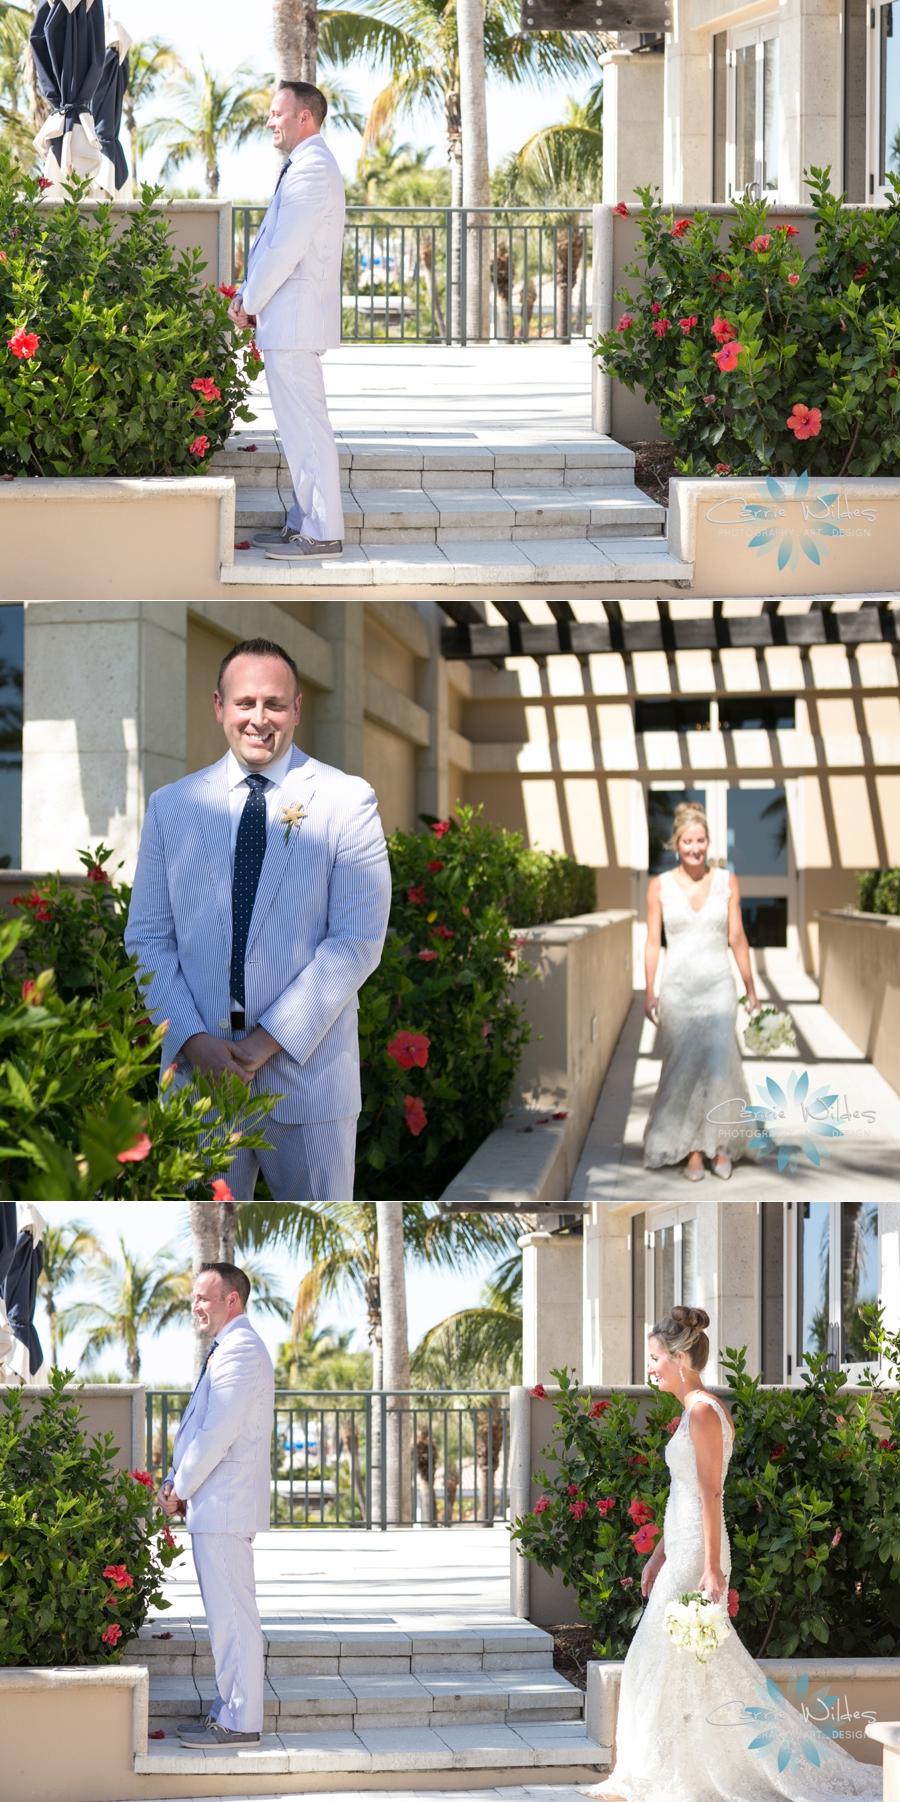 3_17_18 Annie and Justin Ritz Carlton Sarasota Wedding_0010.jpg